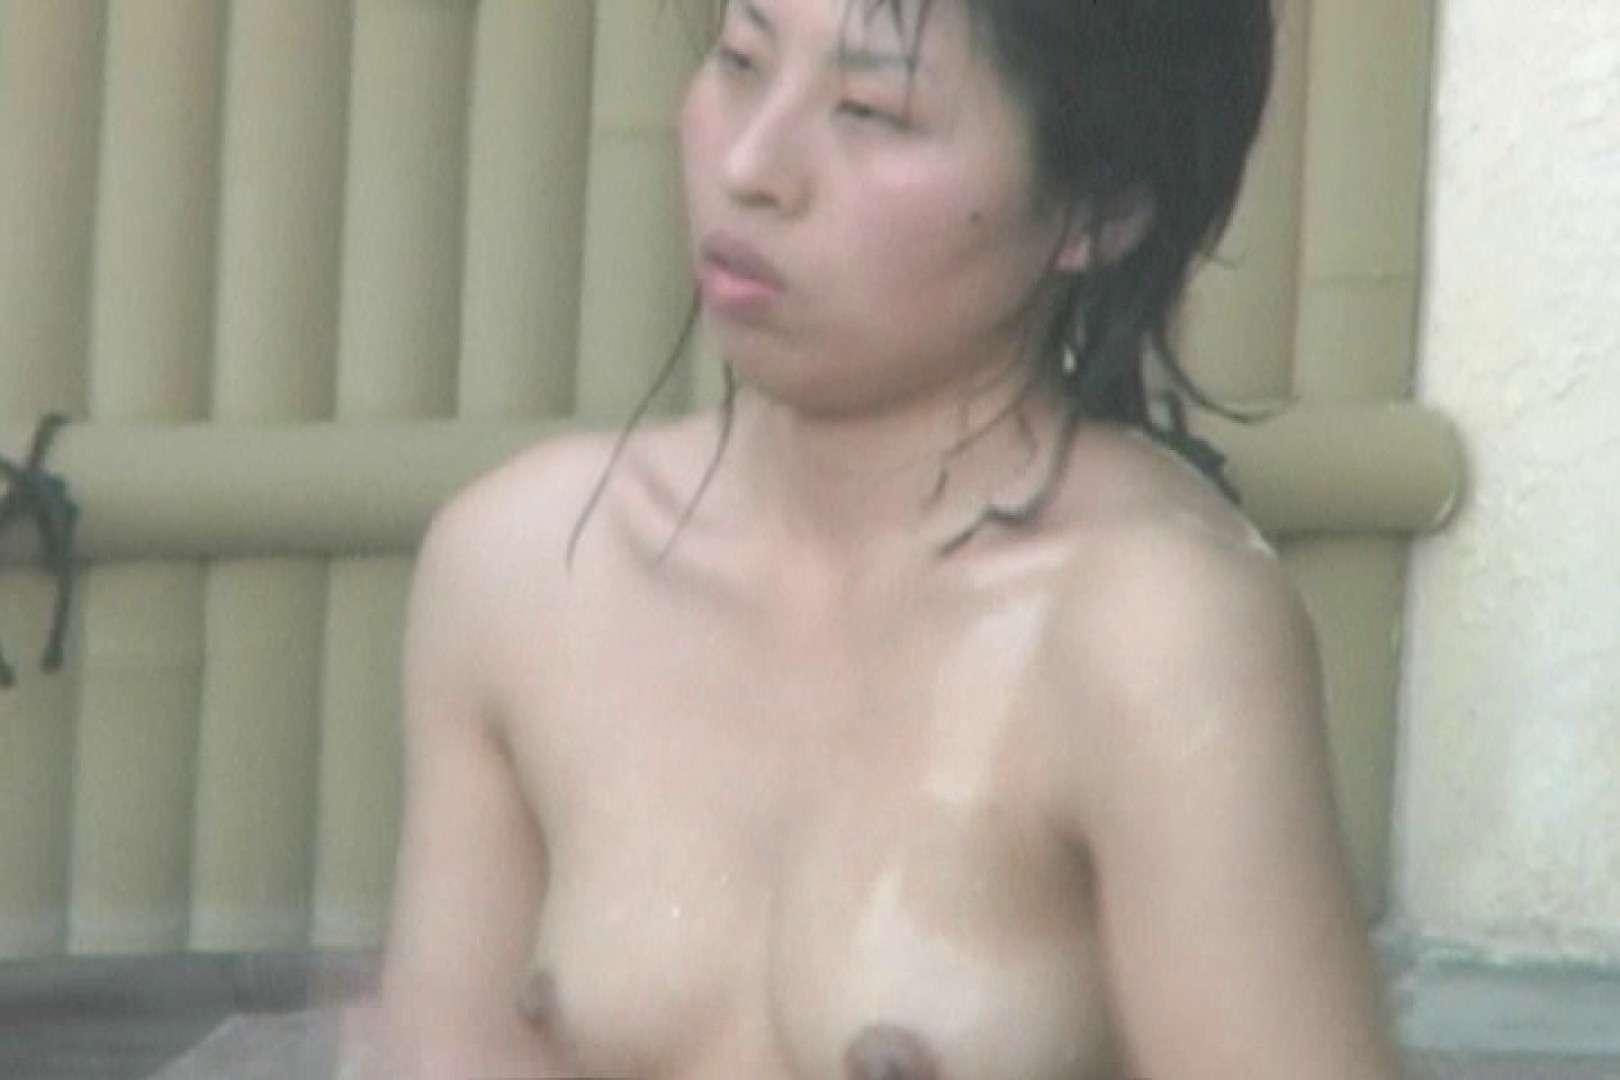 Aquaな露天風呂Vol.589 盗撮 | HなOL  105pic 76